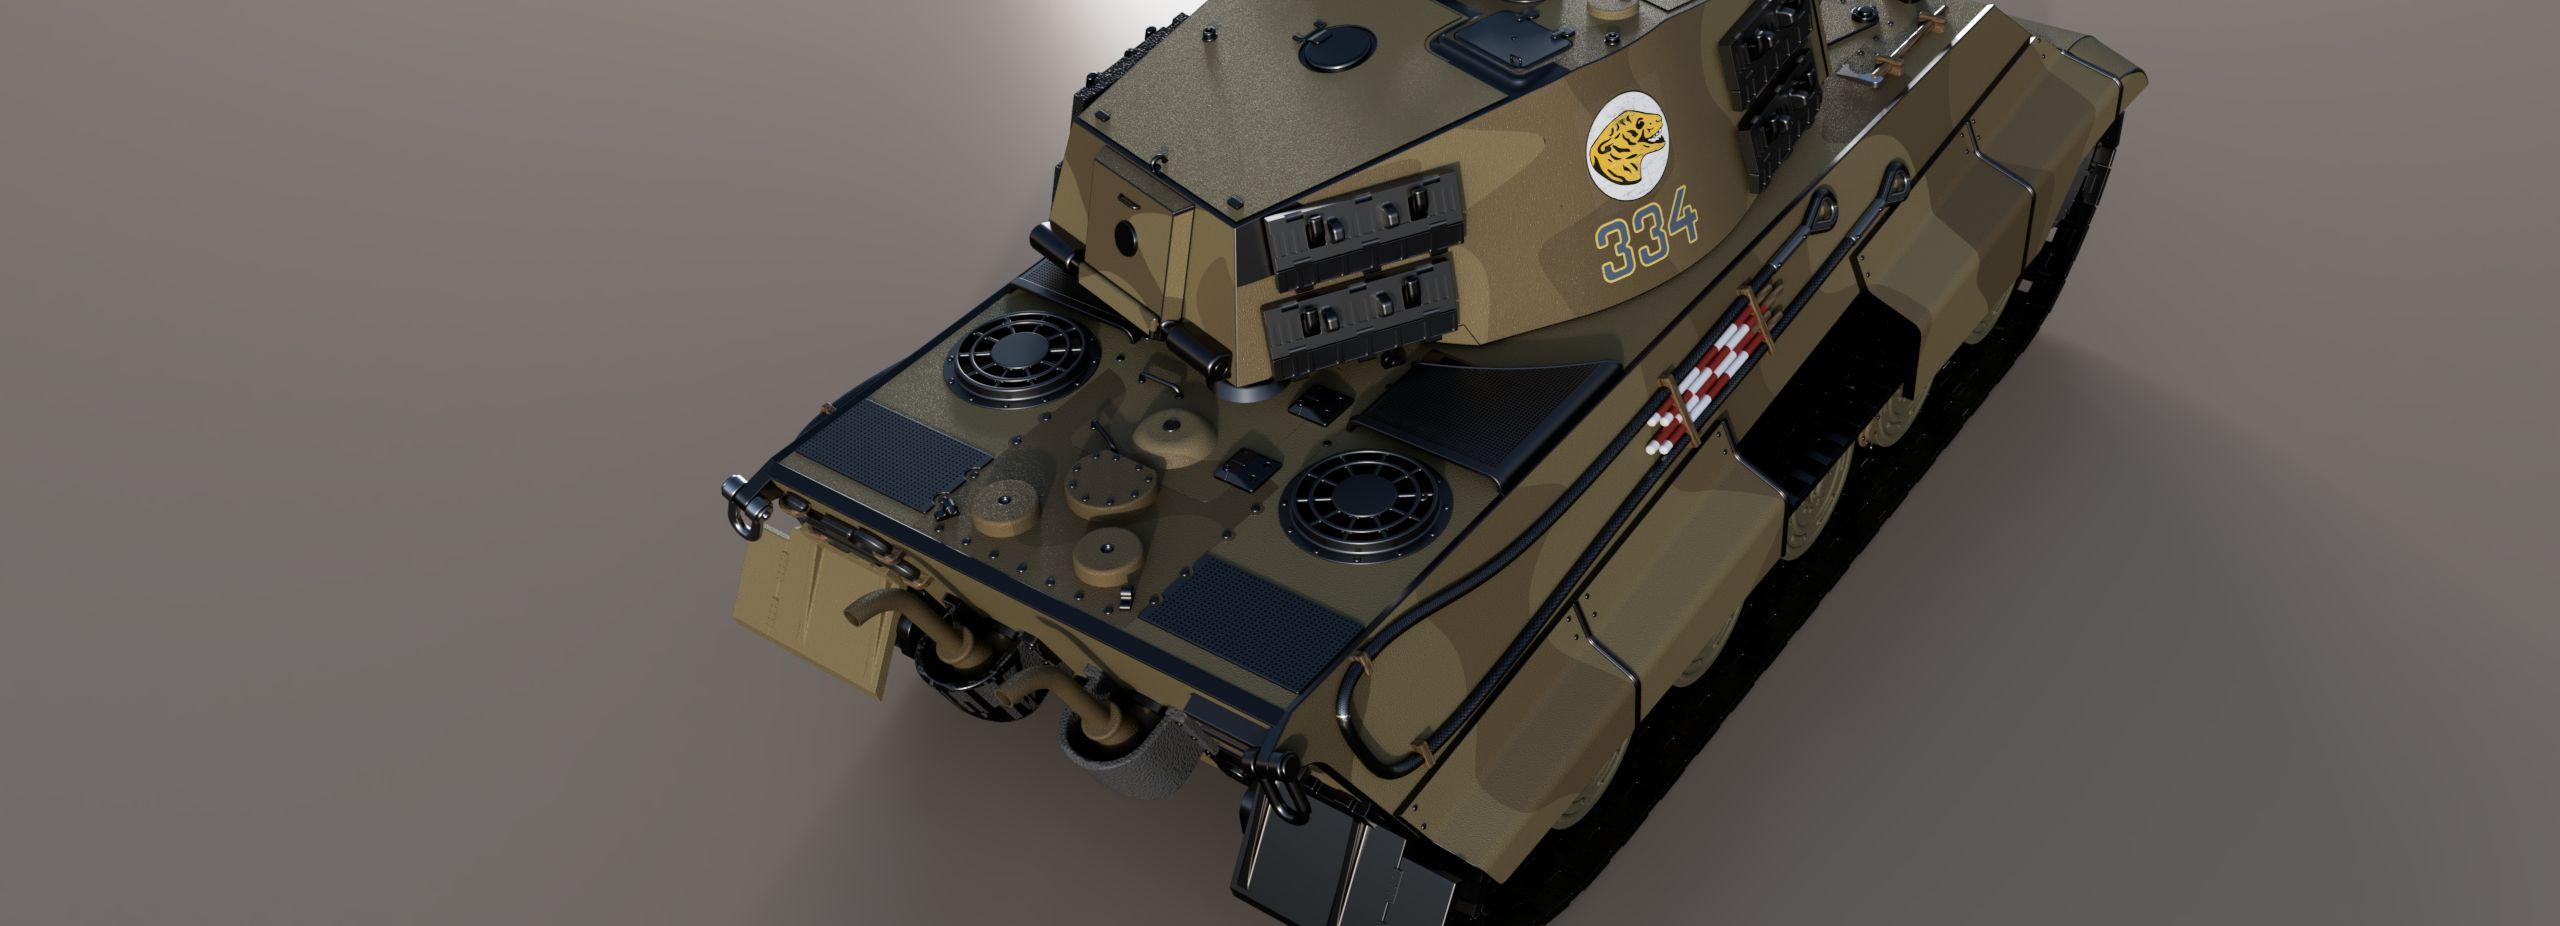 Tiger-ii-komplett-wuste-2018-sep-20-08-16-34am-000-customizedview38008703749-png-3500-3500